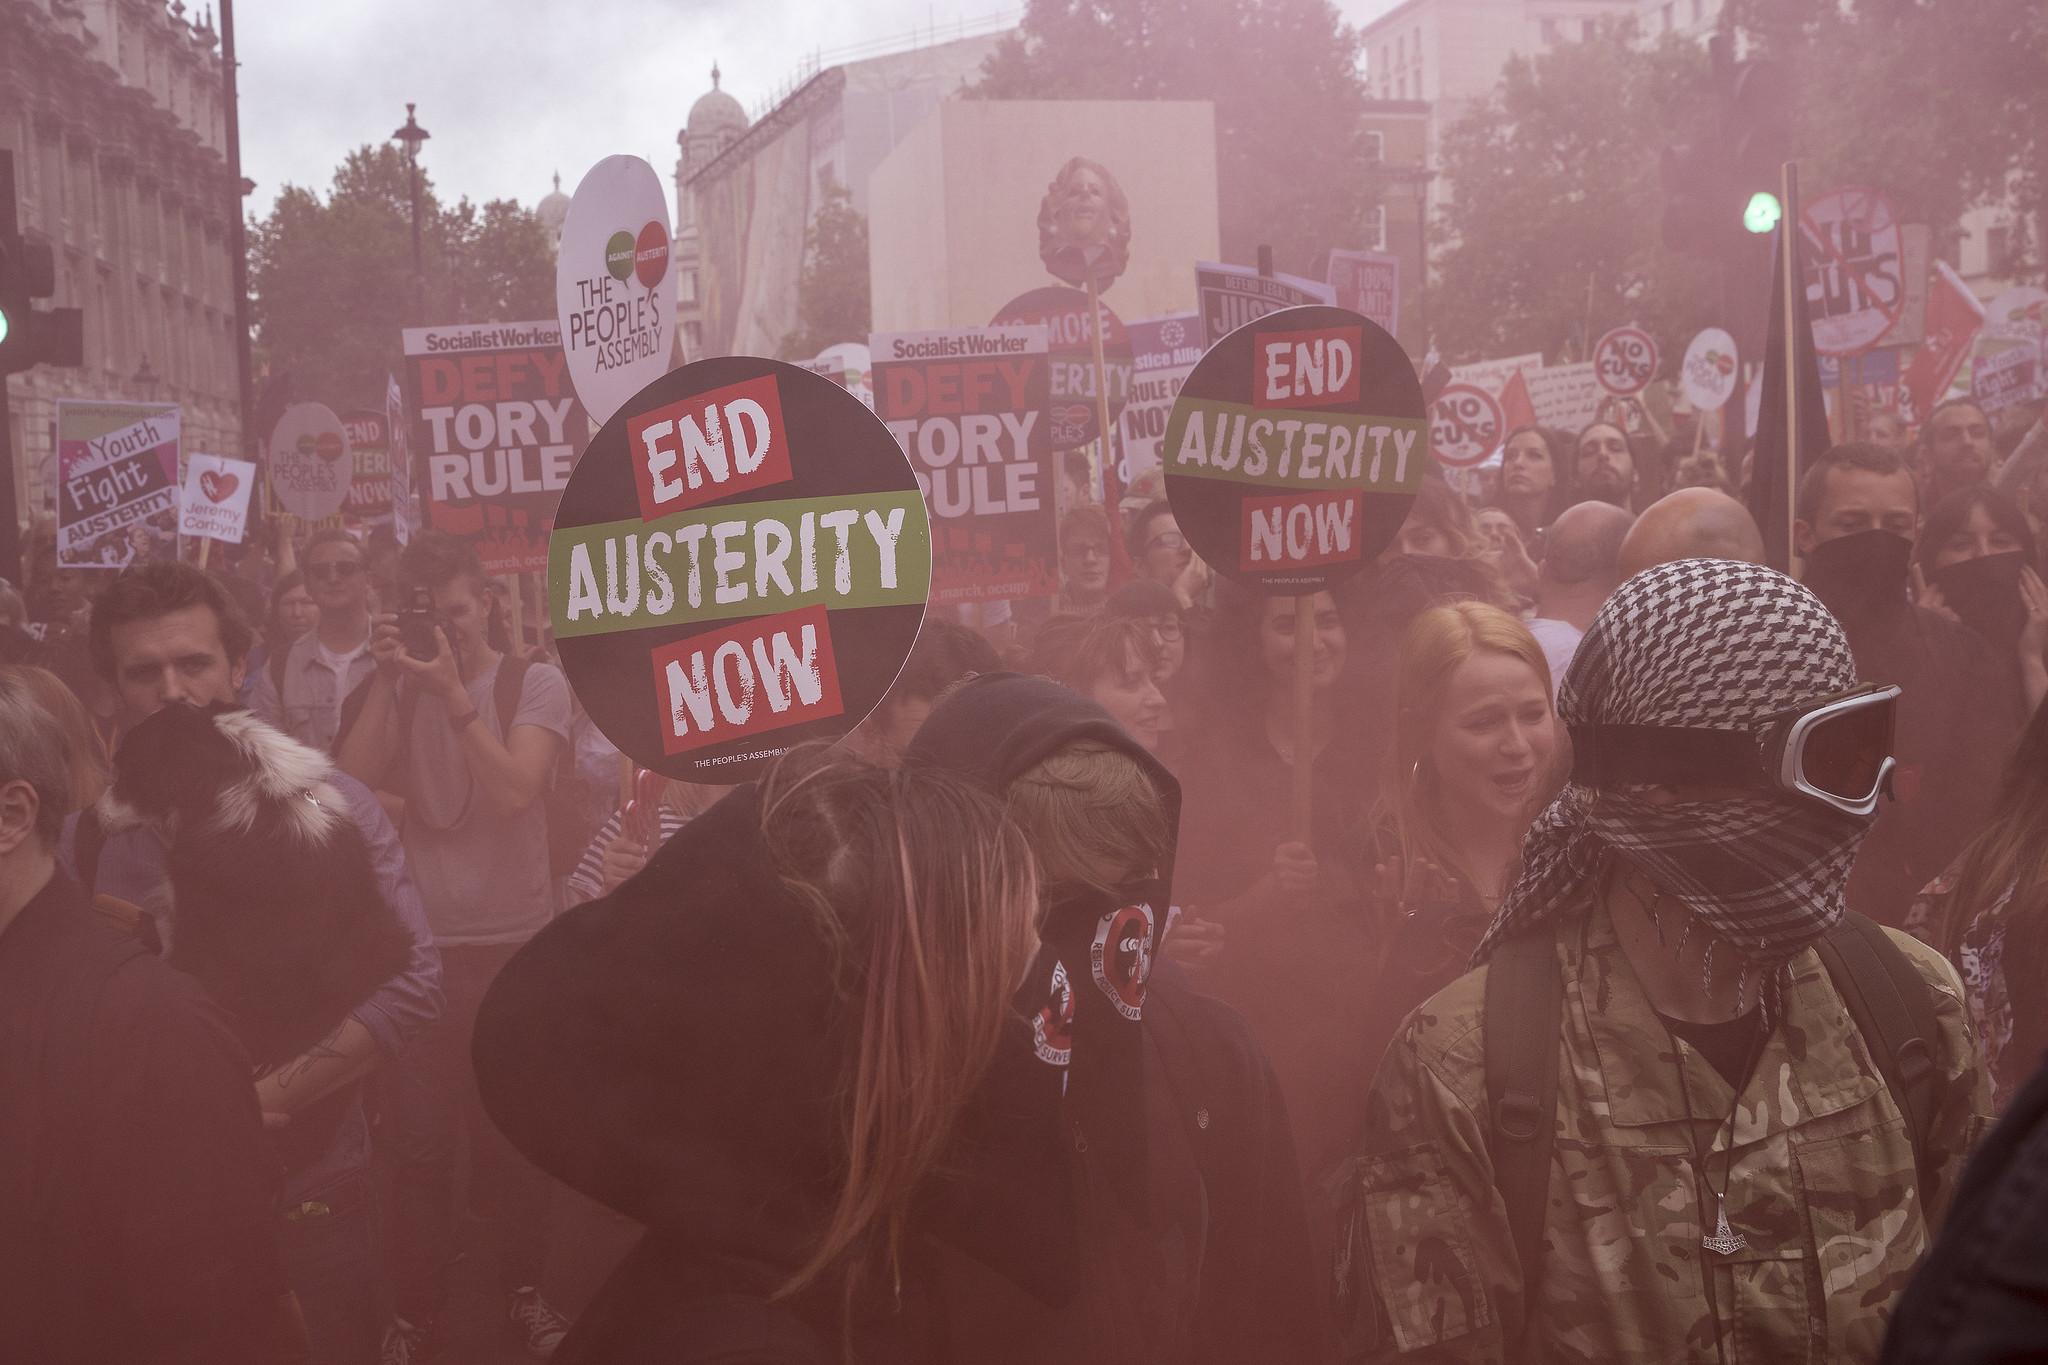 london anti-austerity demonstration